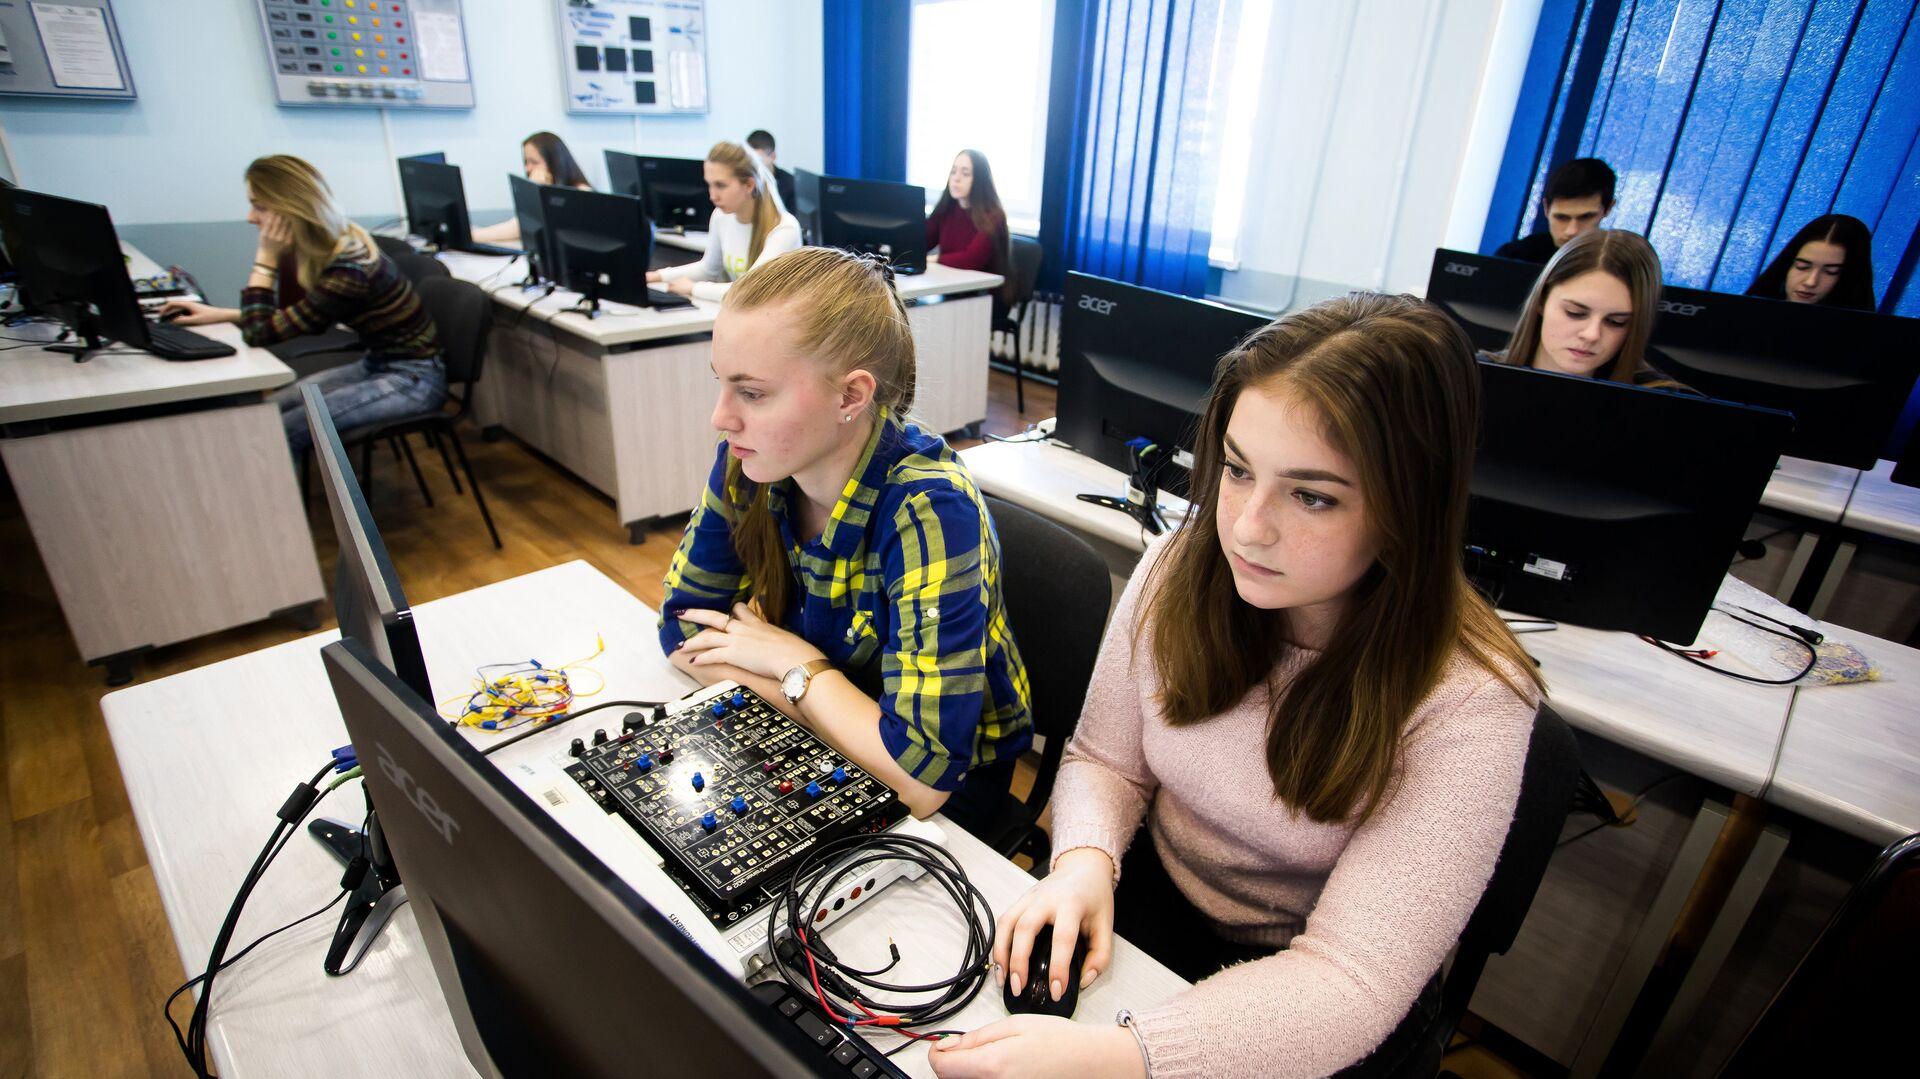 Студенты ВГУЭС на проекте Агентство кибербезопасности  - РИА Новости, 1920, 25.08.2020